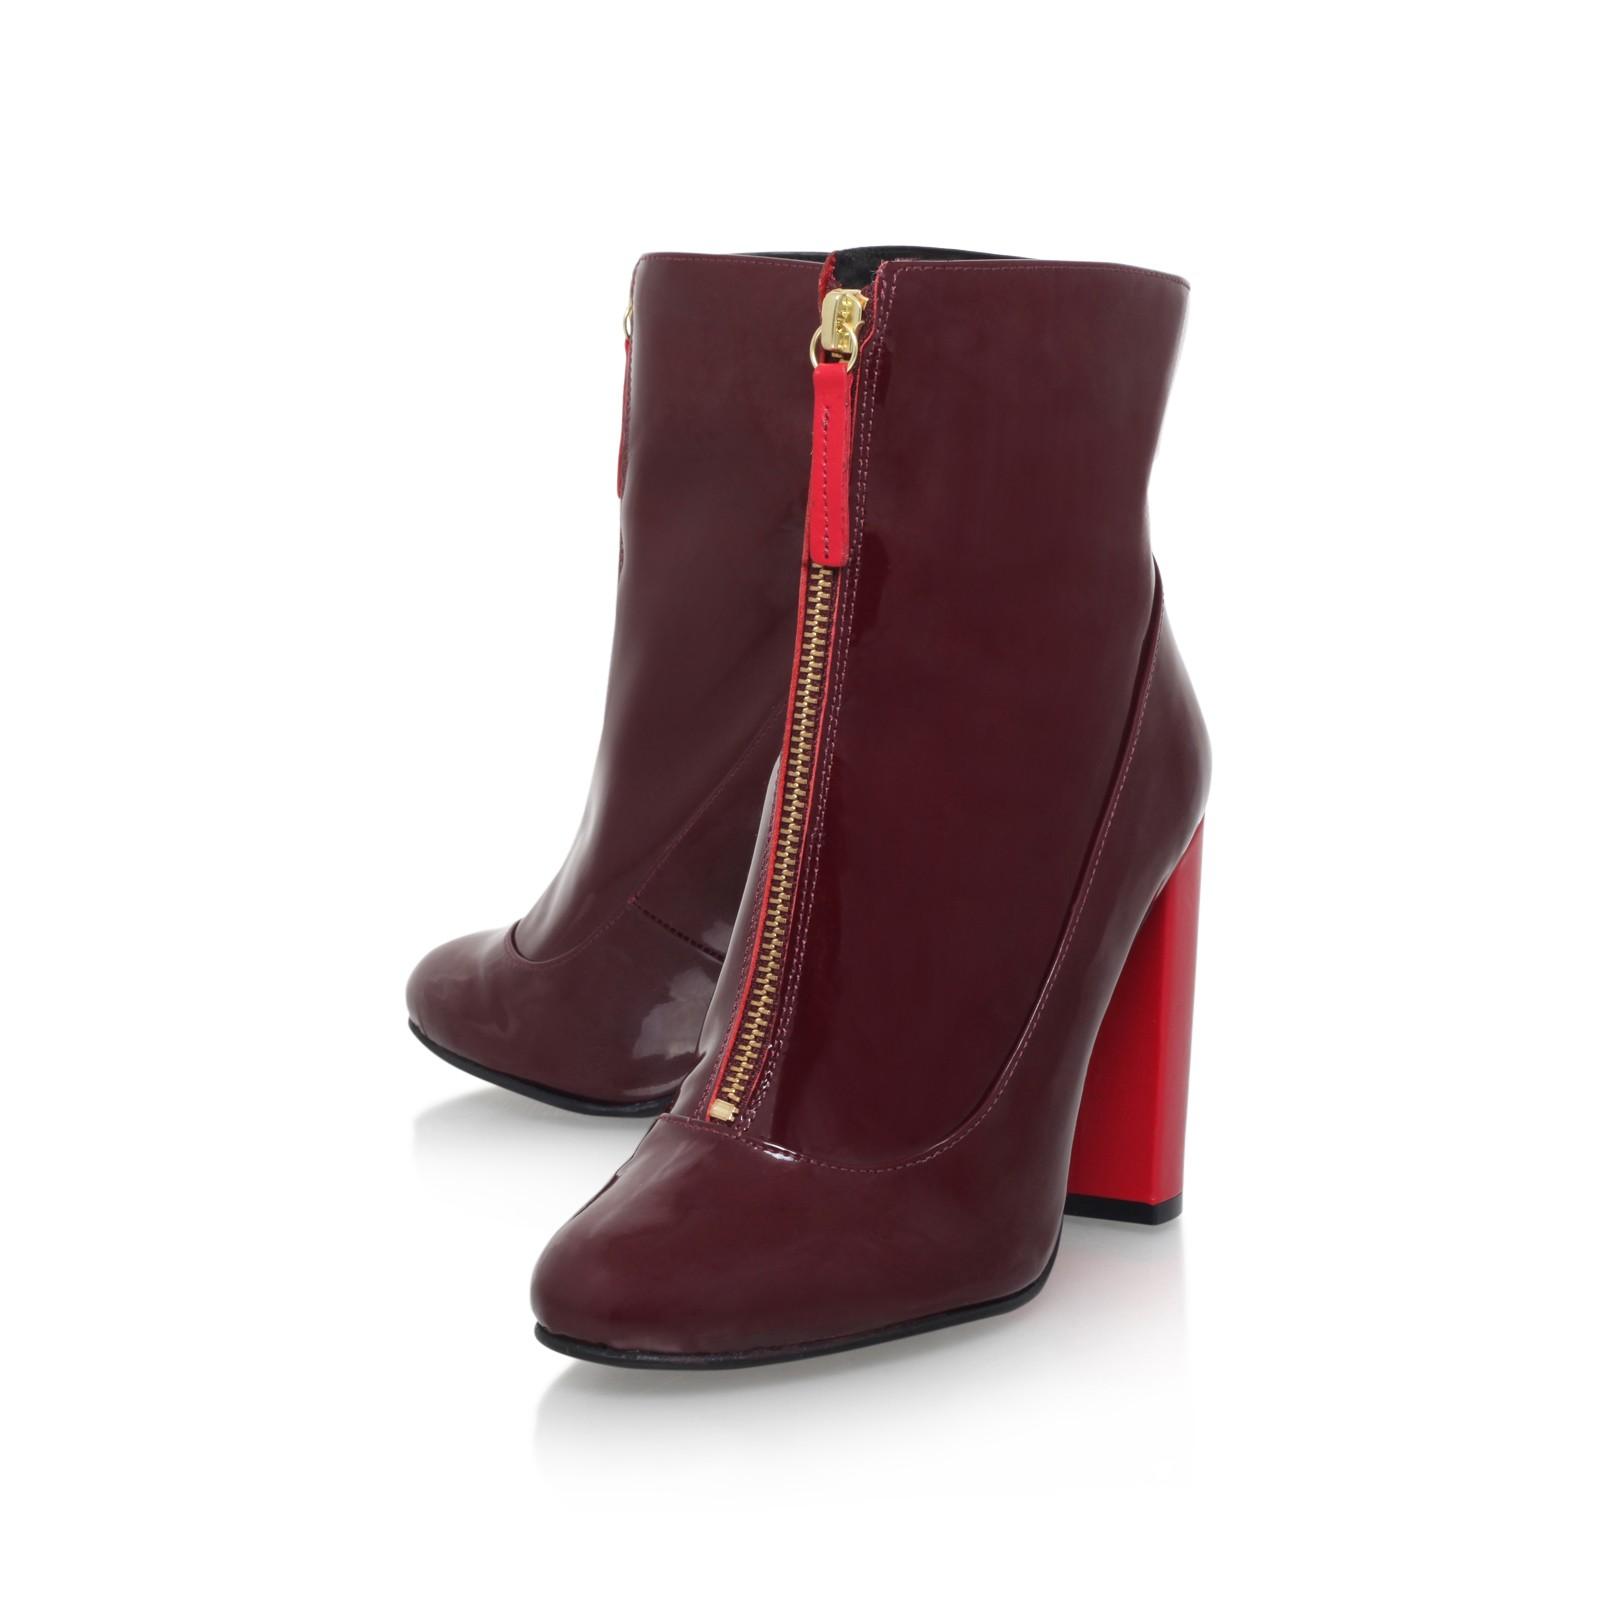 STEPHAN Wine High Heel Ankle Boots by Carvela Kurt Geiger